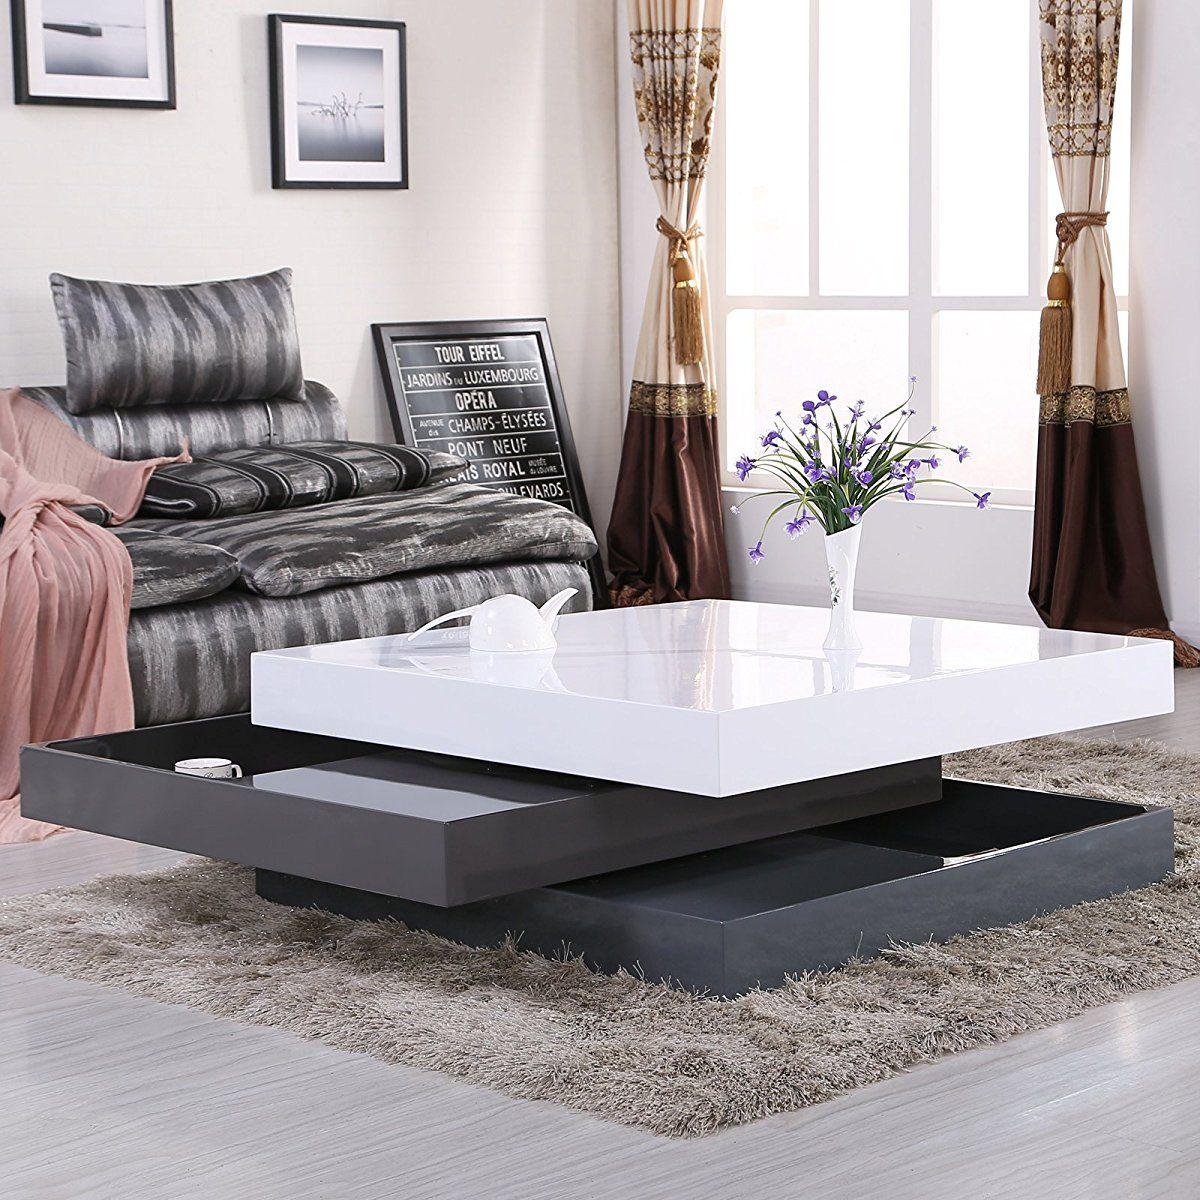 Uenjoy High Gloss Square Storage Rotating Coffee Table W 3 Layers Living Room Furniture Luxury Furniture Design Coffee Table Living Room Coffee Table [ jpg ]